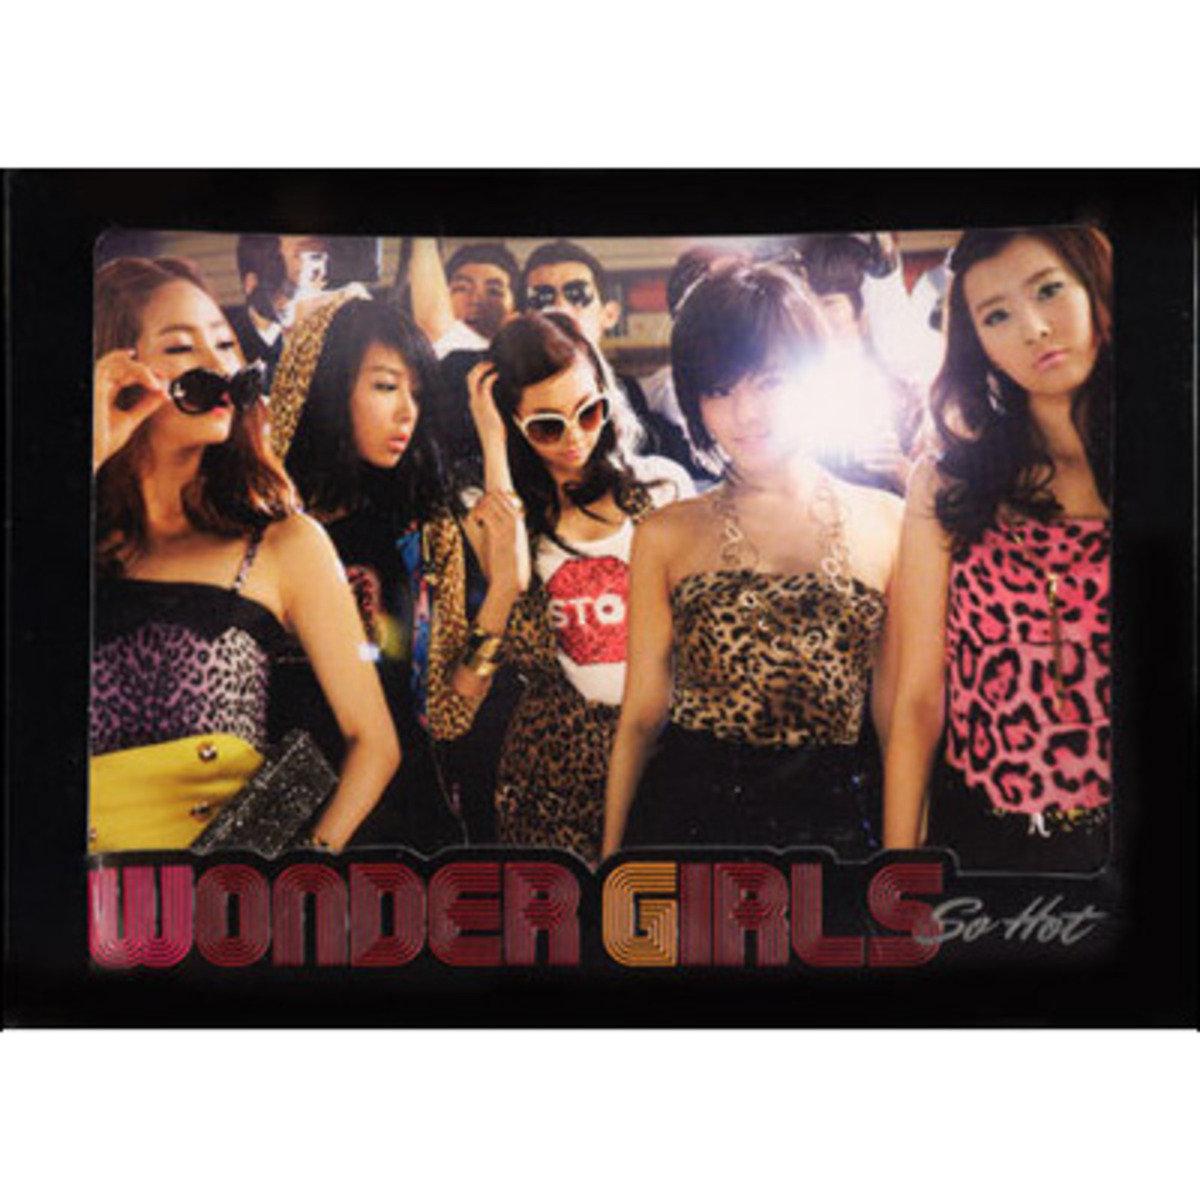 Wonder Girls - Single Album [So Hot] (The 3rd Project)_36335